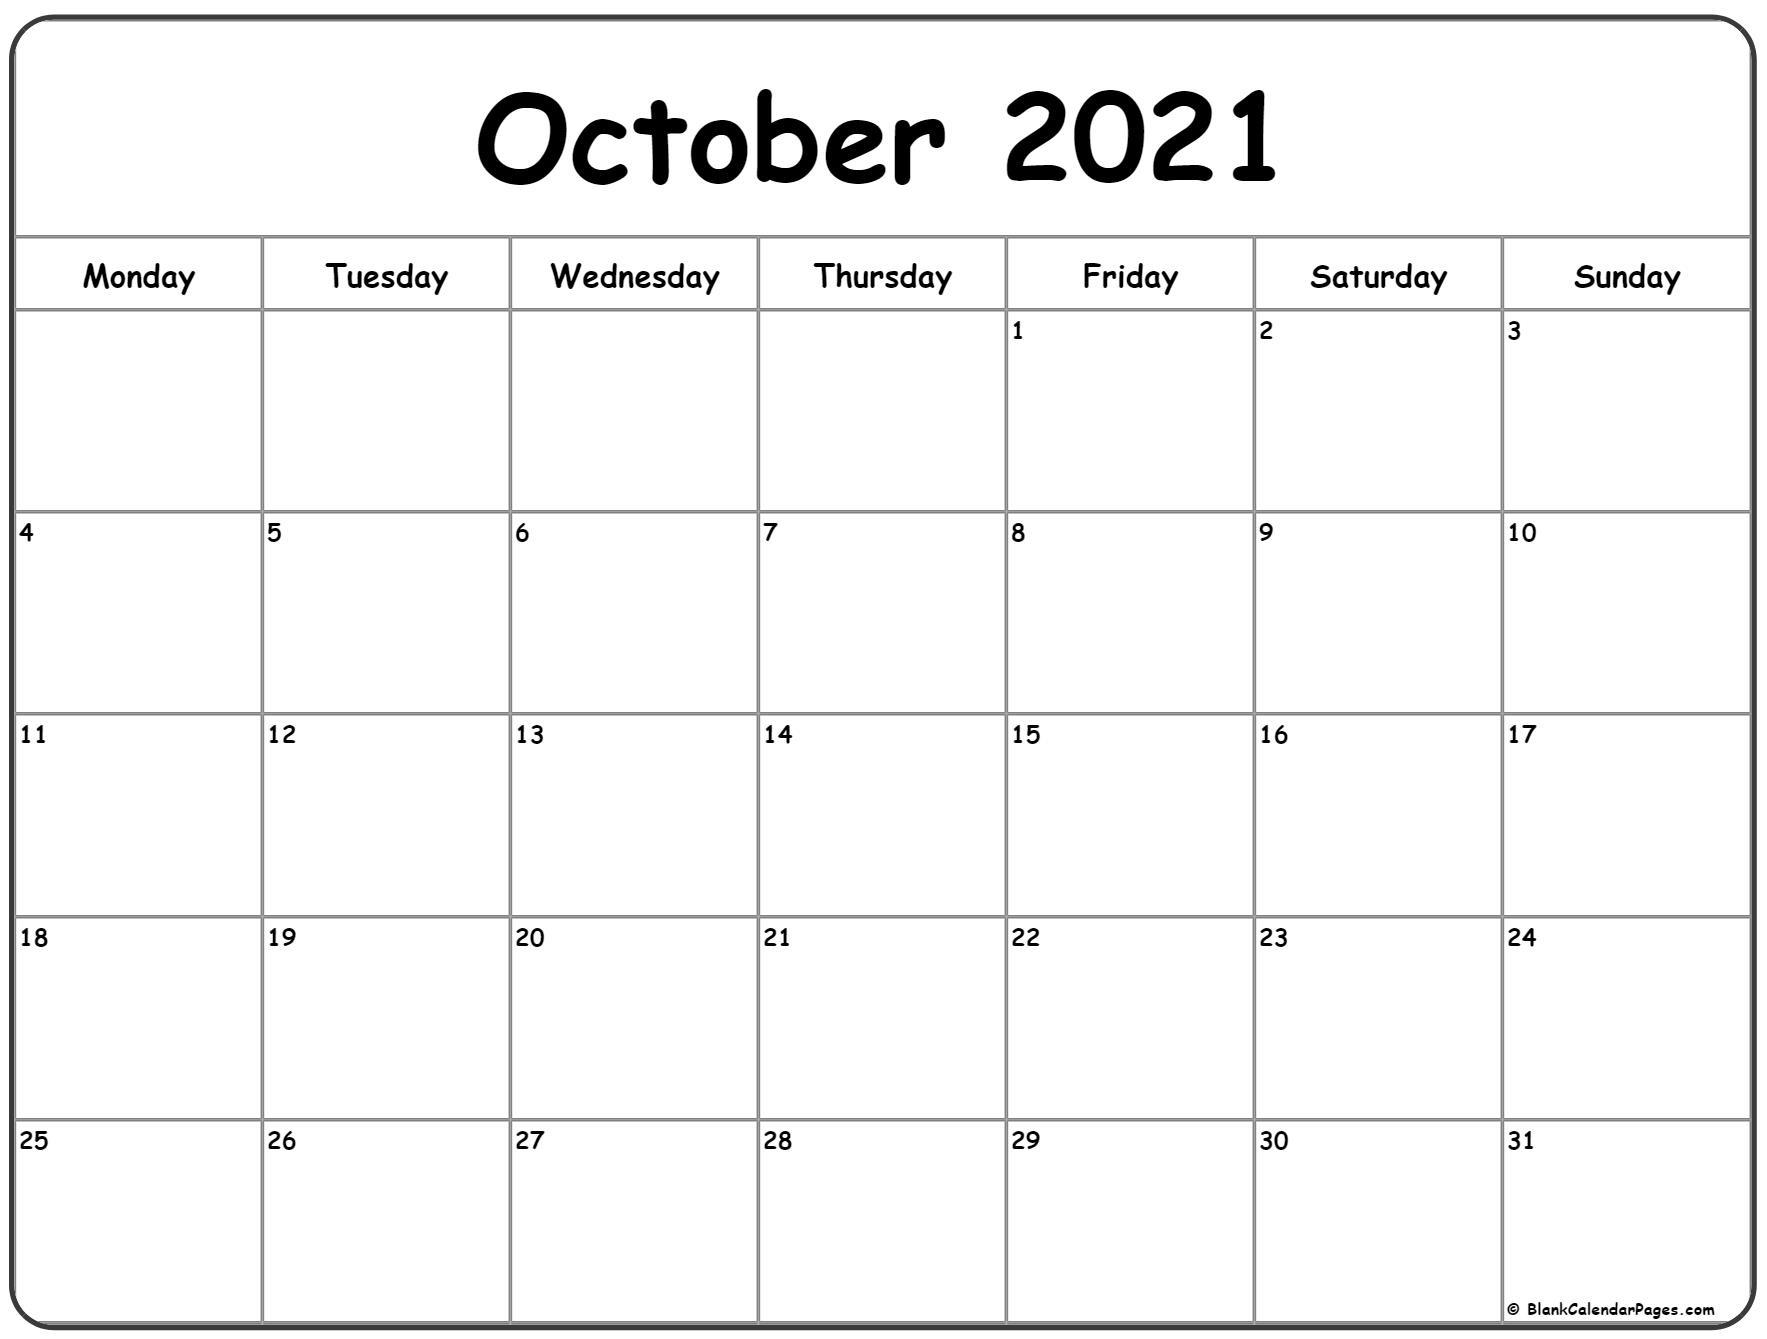 October Calendar 2021 | Month Calendar Printable October 2020 - September 2021 Calendar